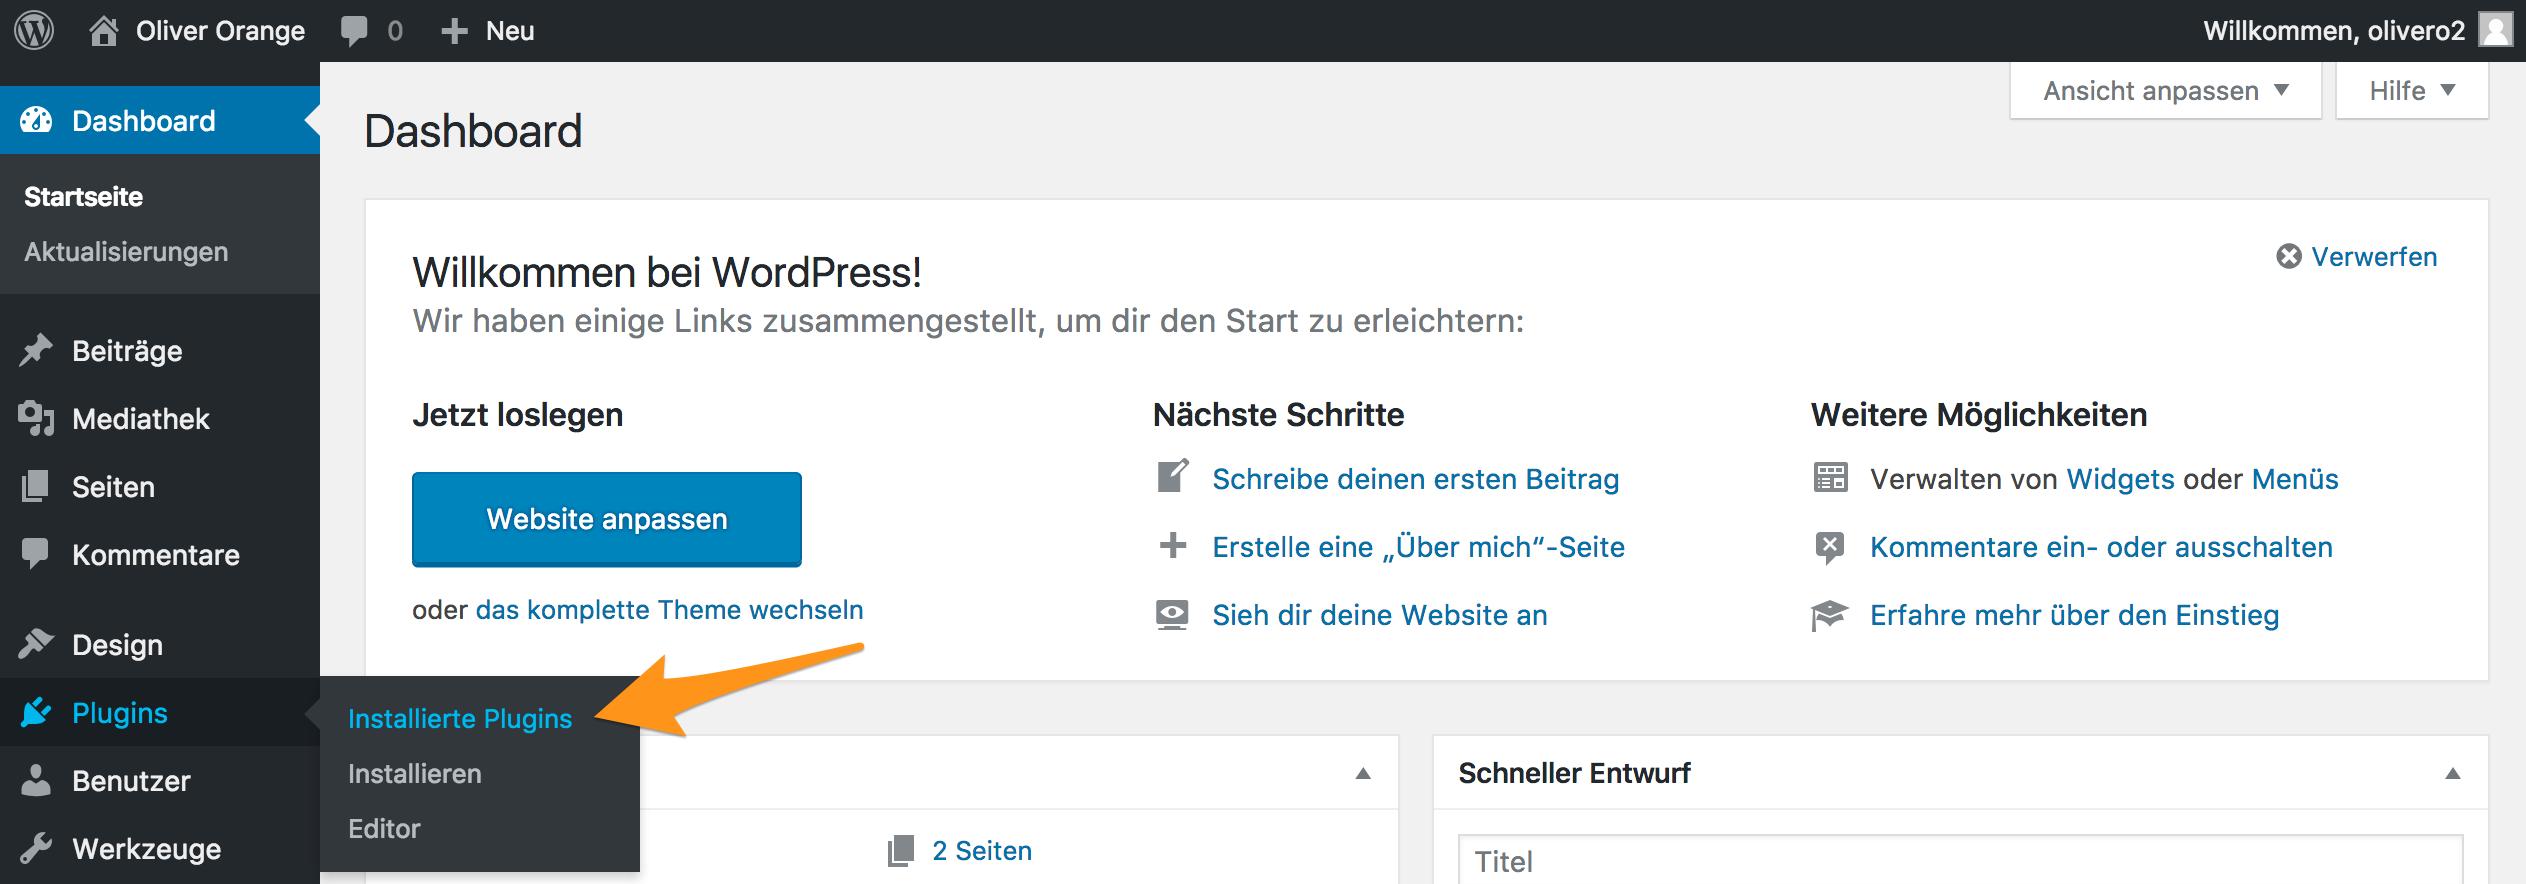 Menü «Plugins» im WordPress-Backend